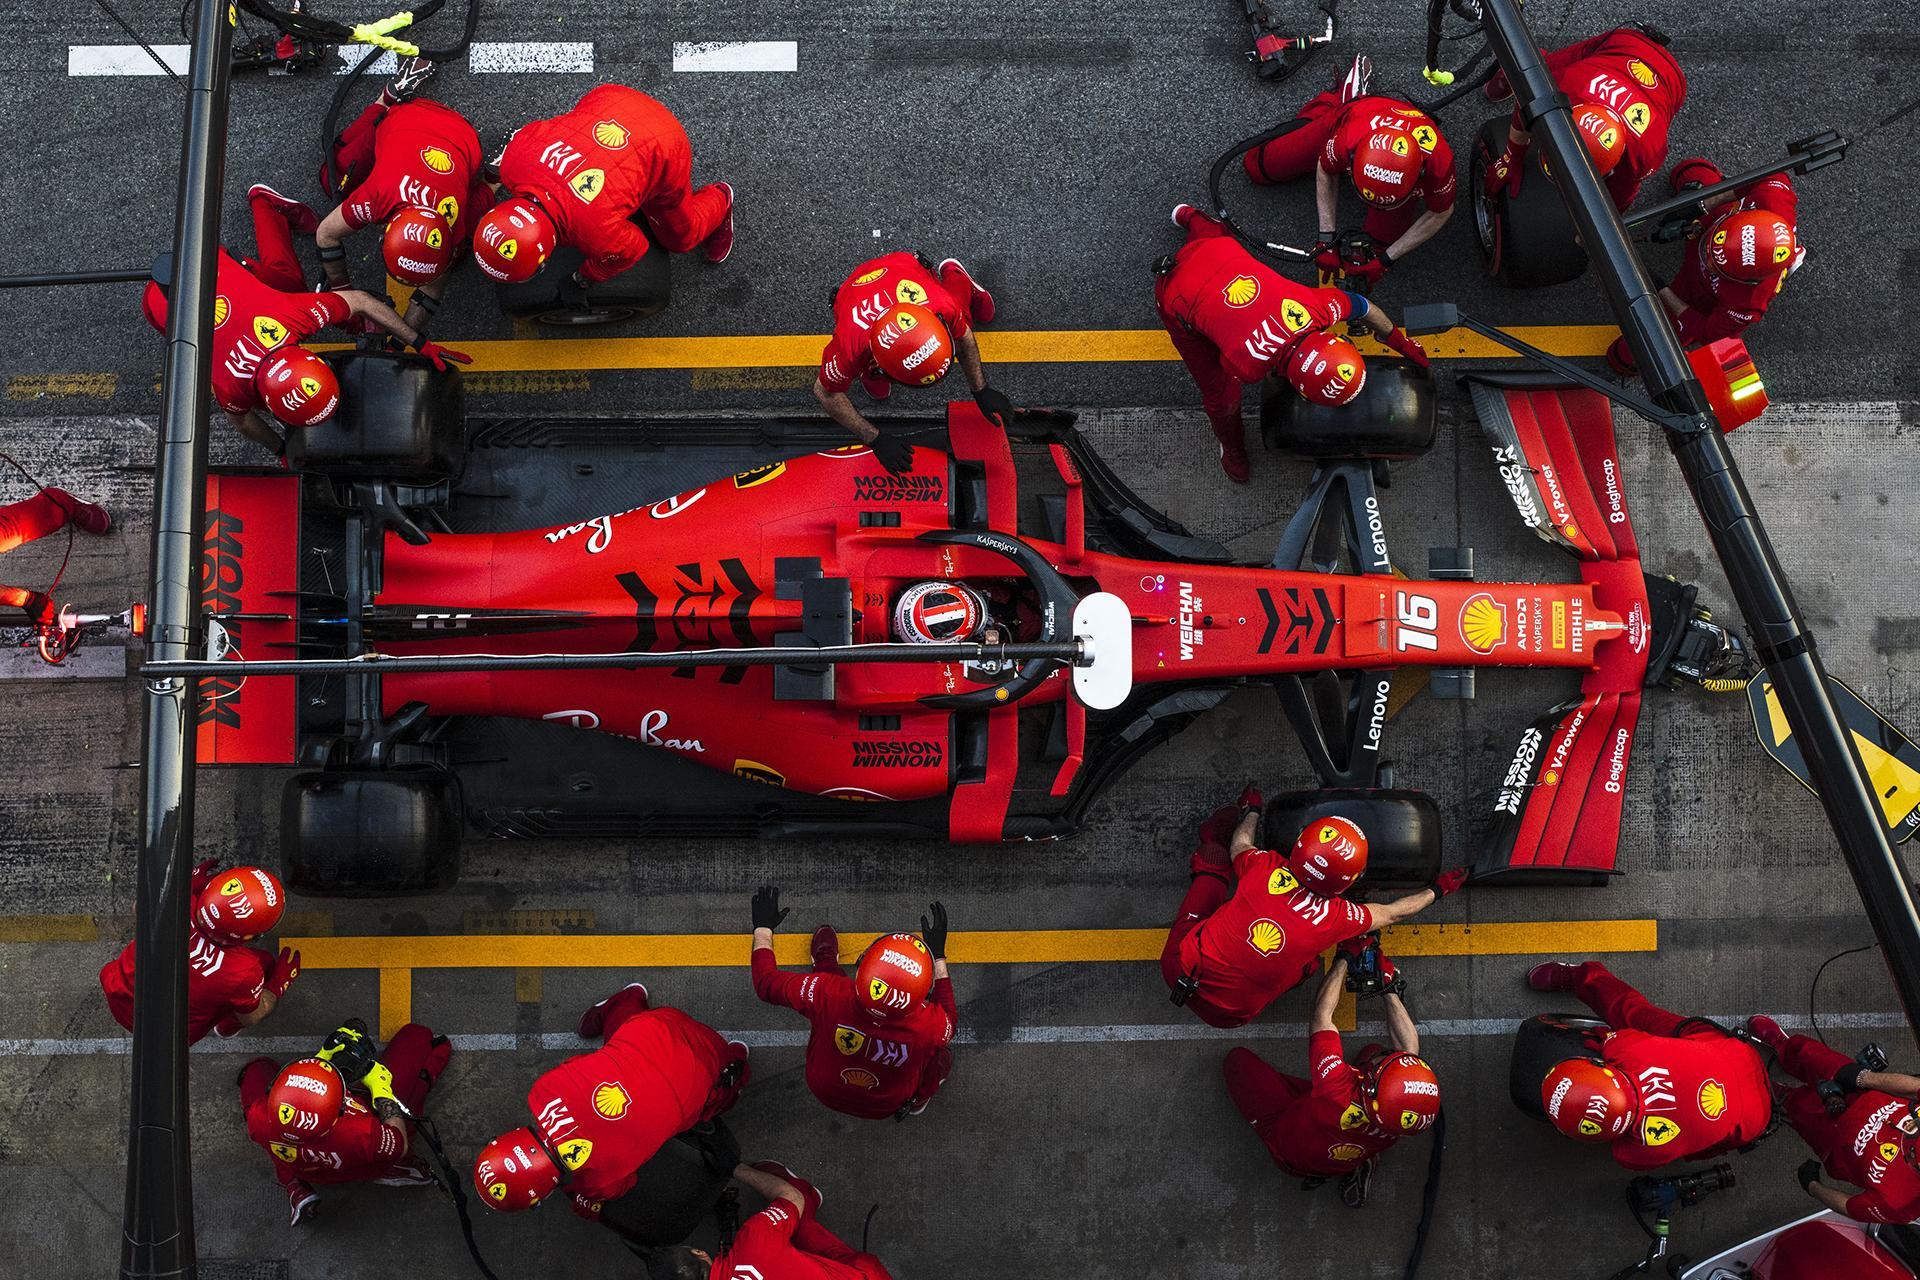 Ferrari Formula 1 team pit stop